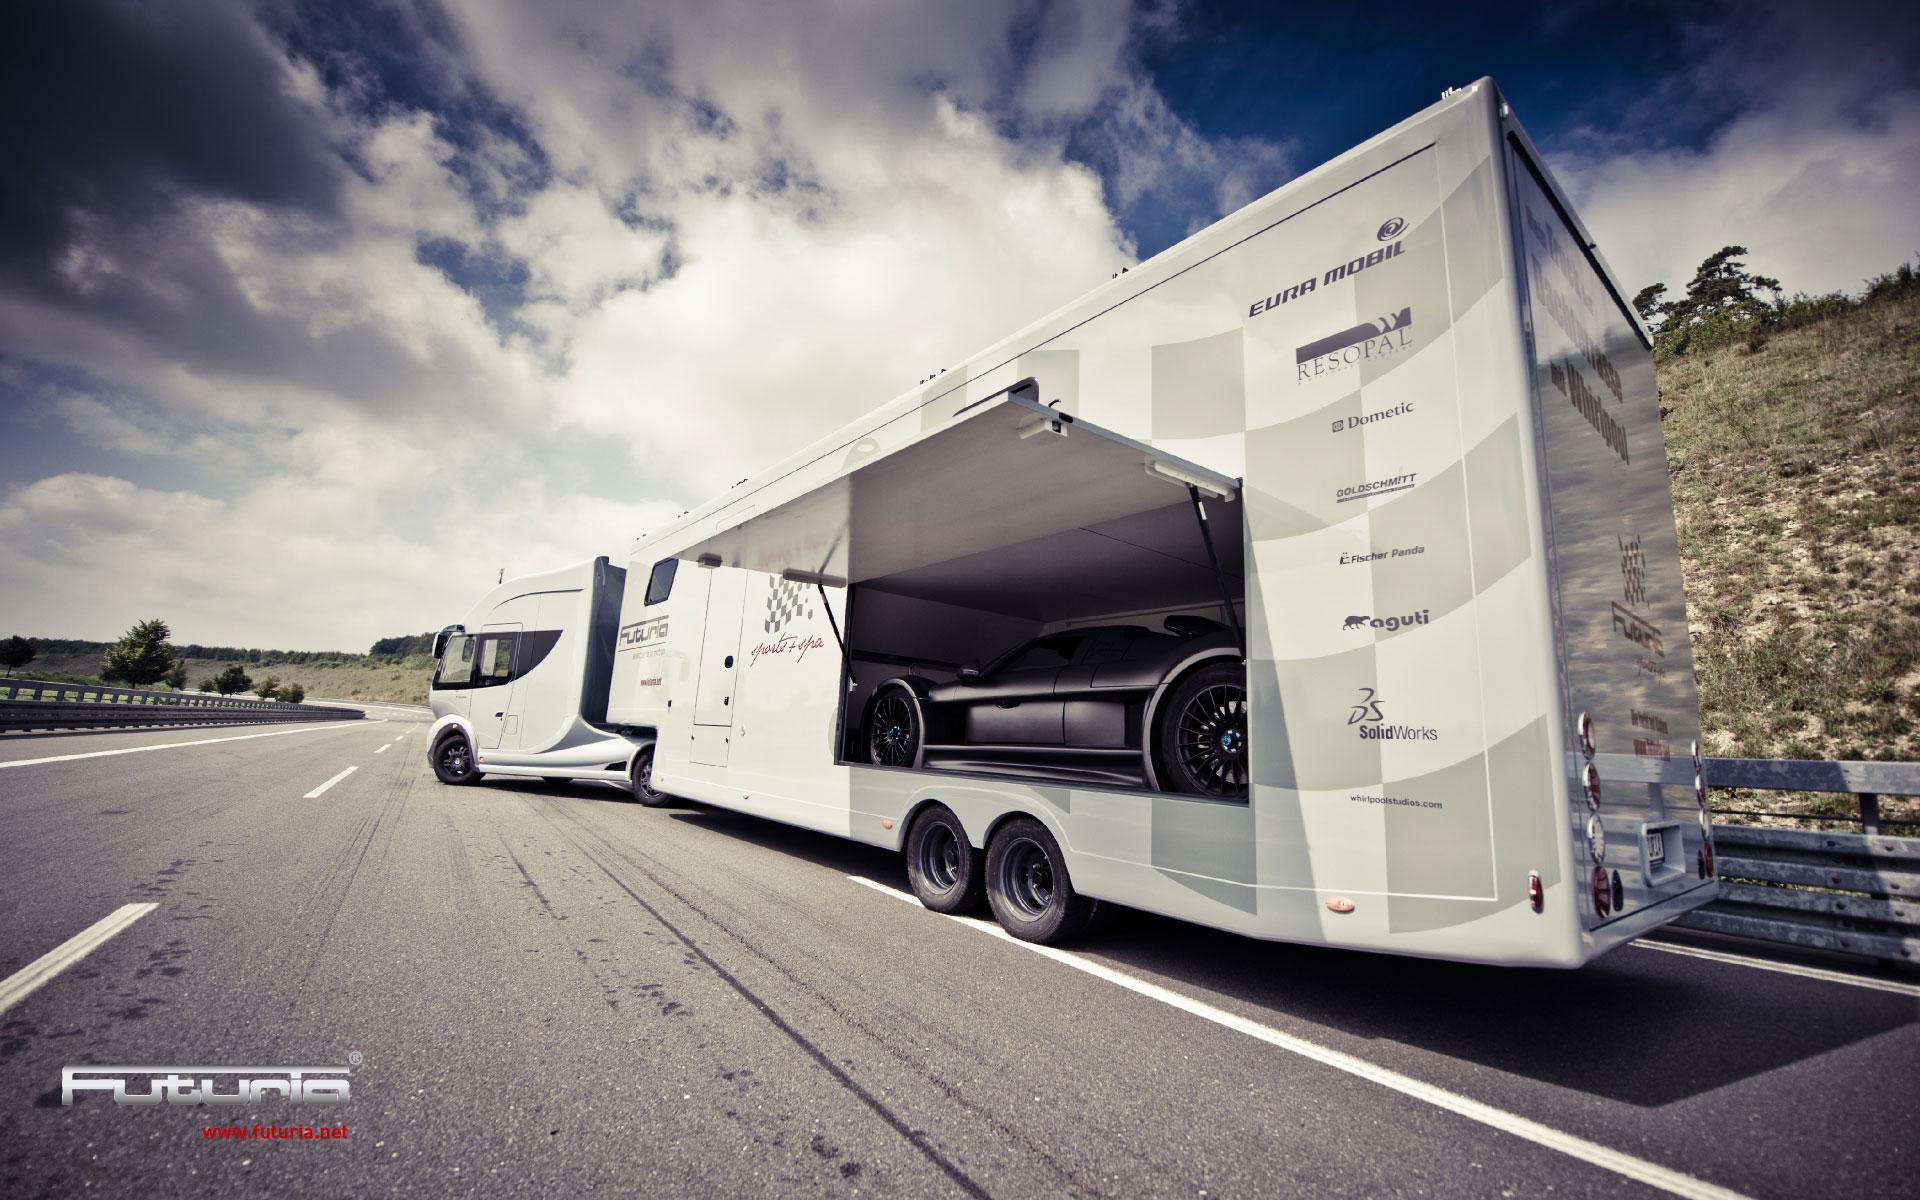 Futuria Sport+Spa Caravan